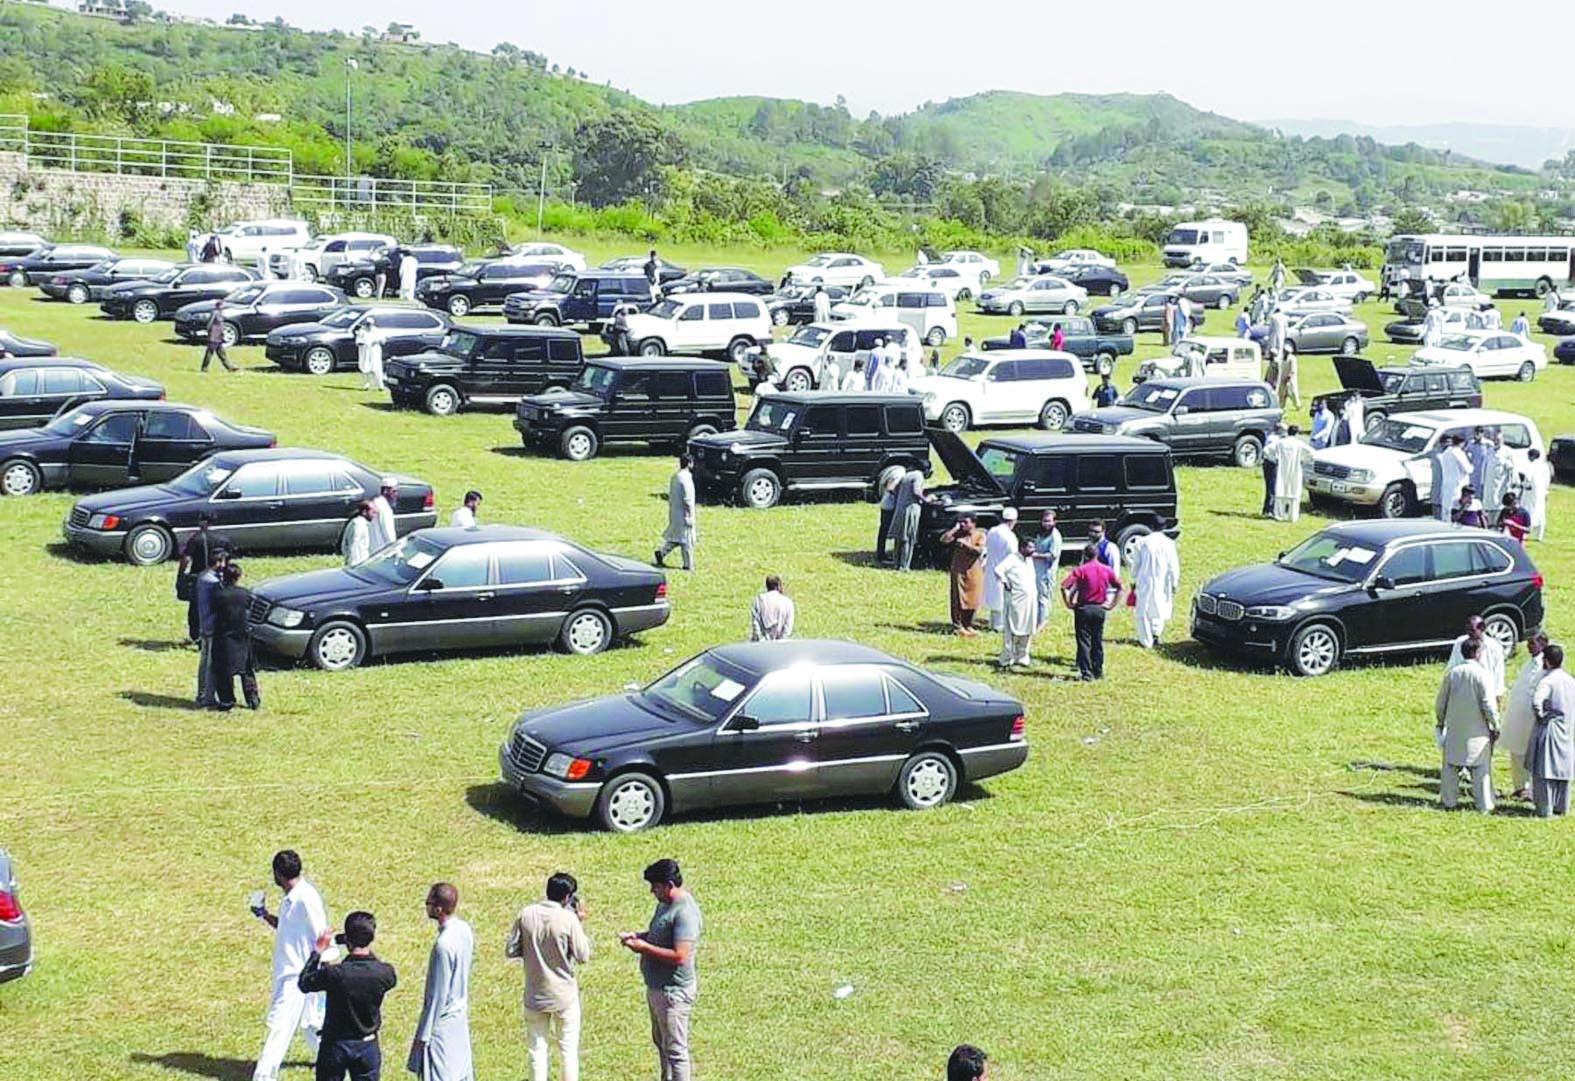 Imran Khan govt auctions 70 luxury cars